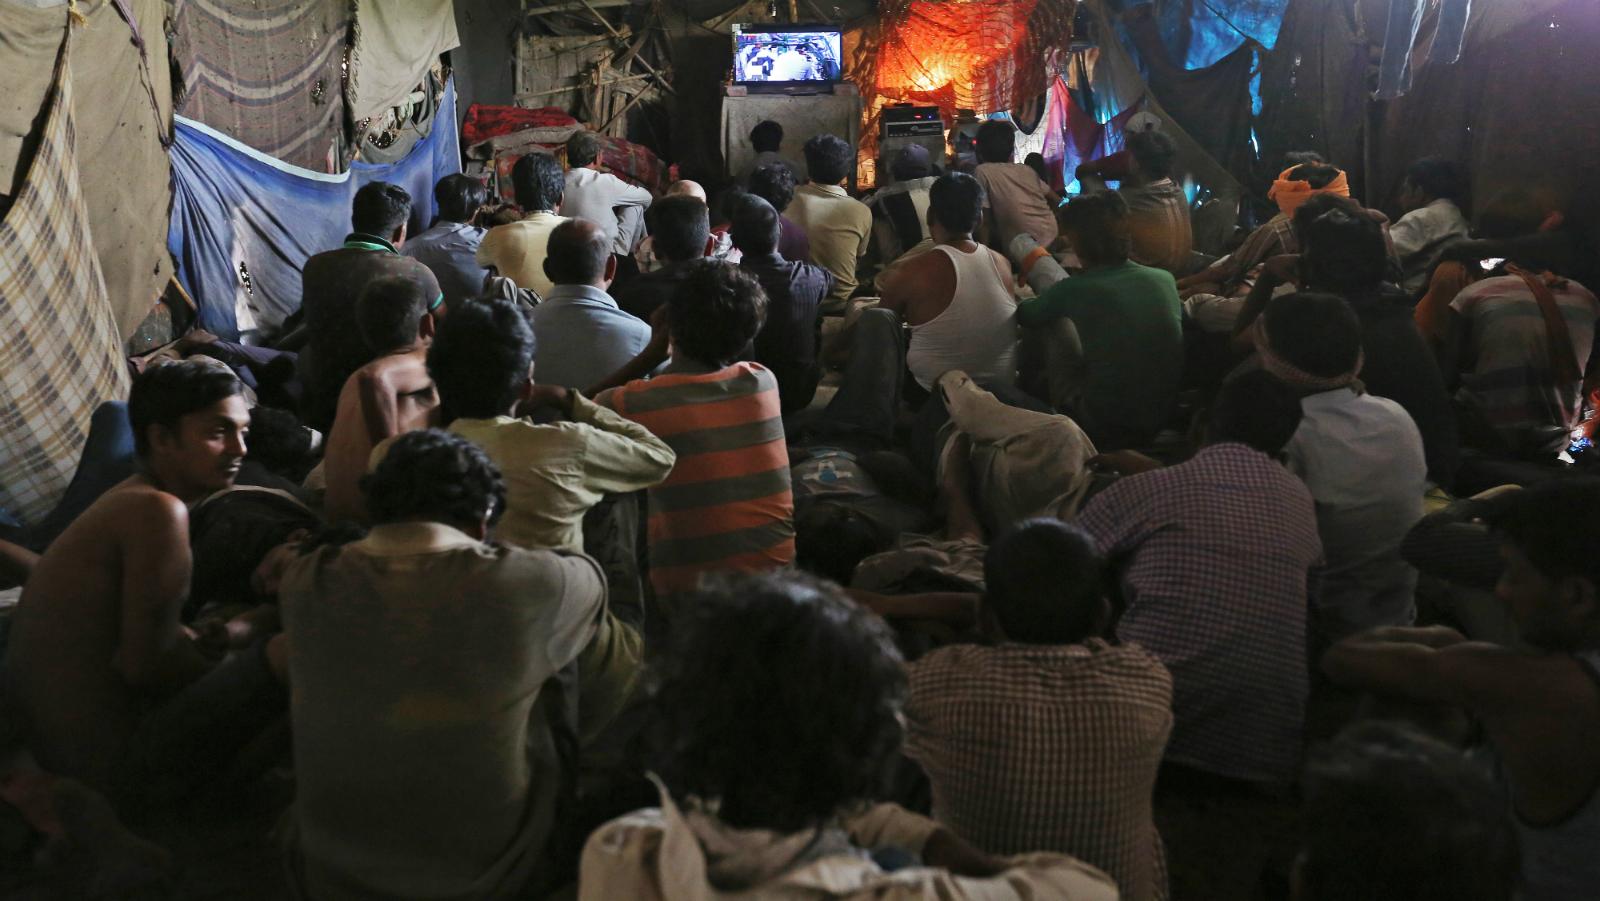 India-Bollywood-Narendra Modi-Shah Rukh Khan-Salman Khan-Tanmay Bhat